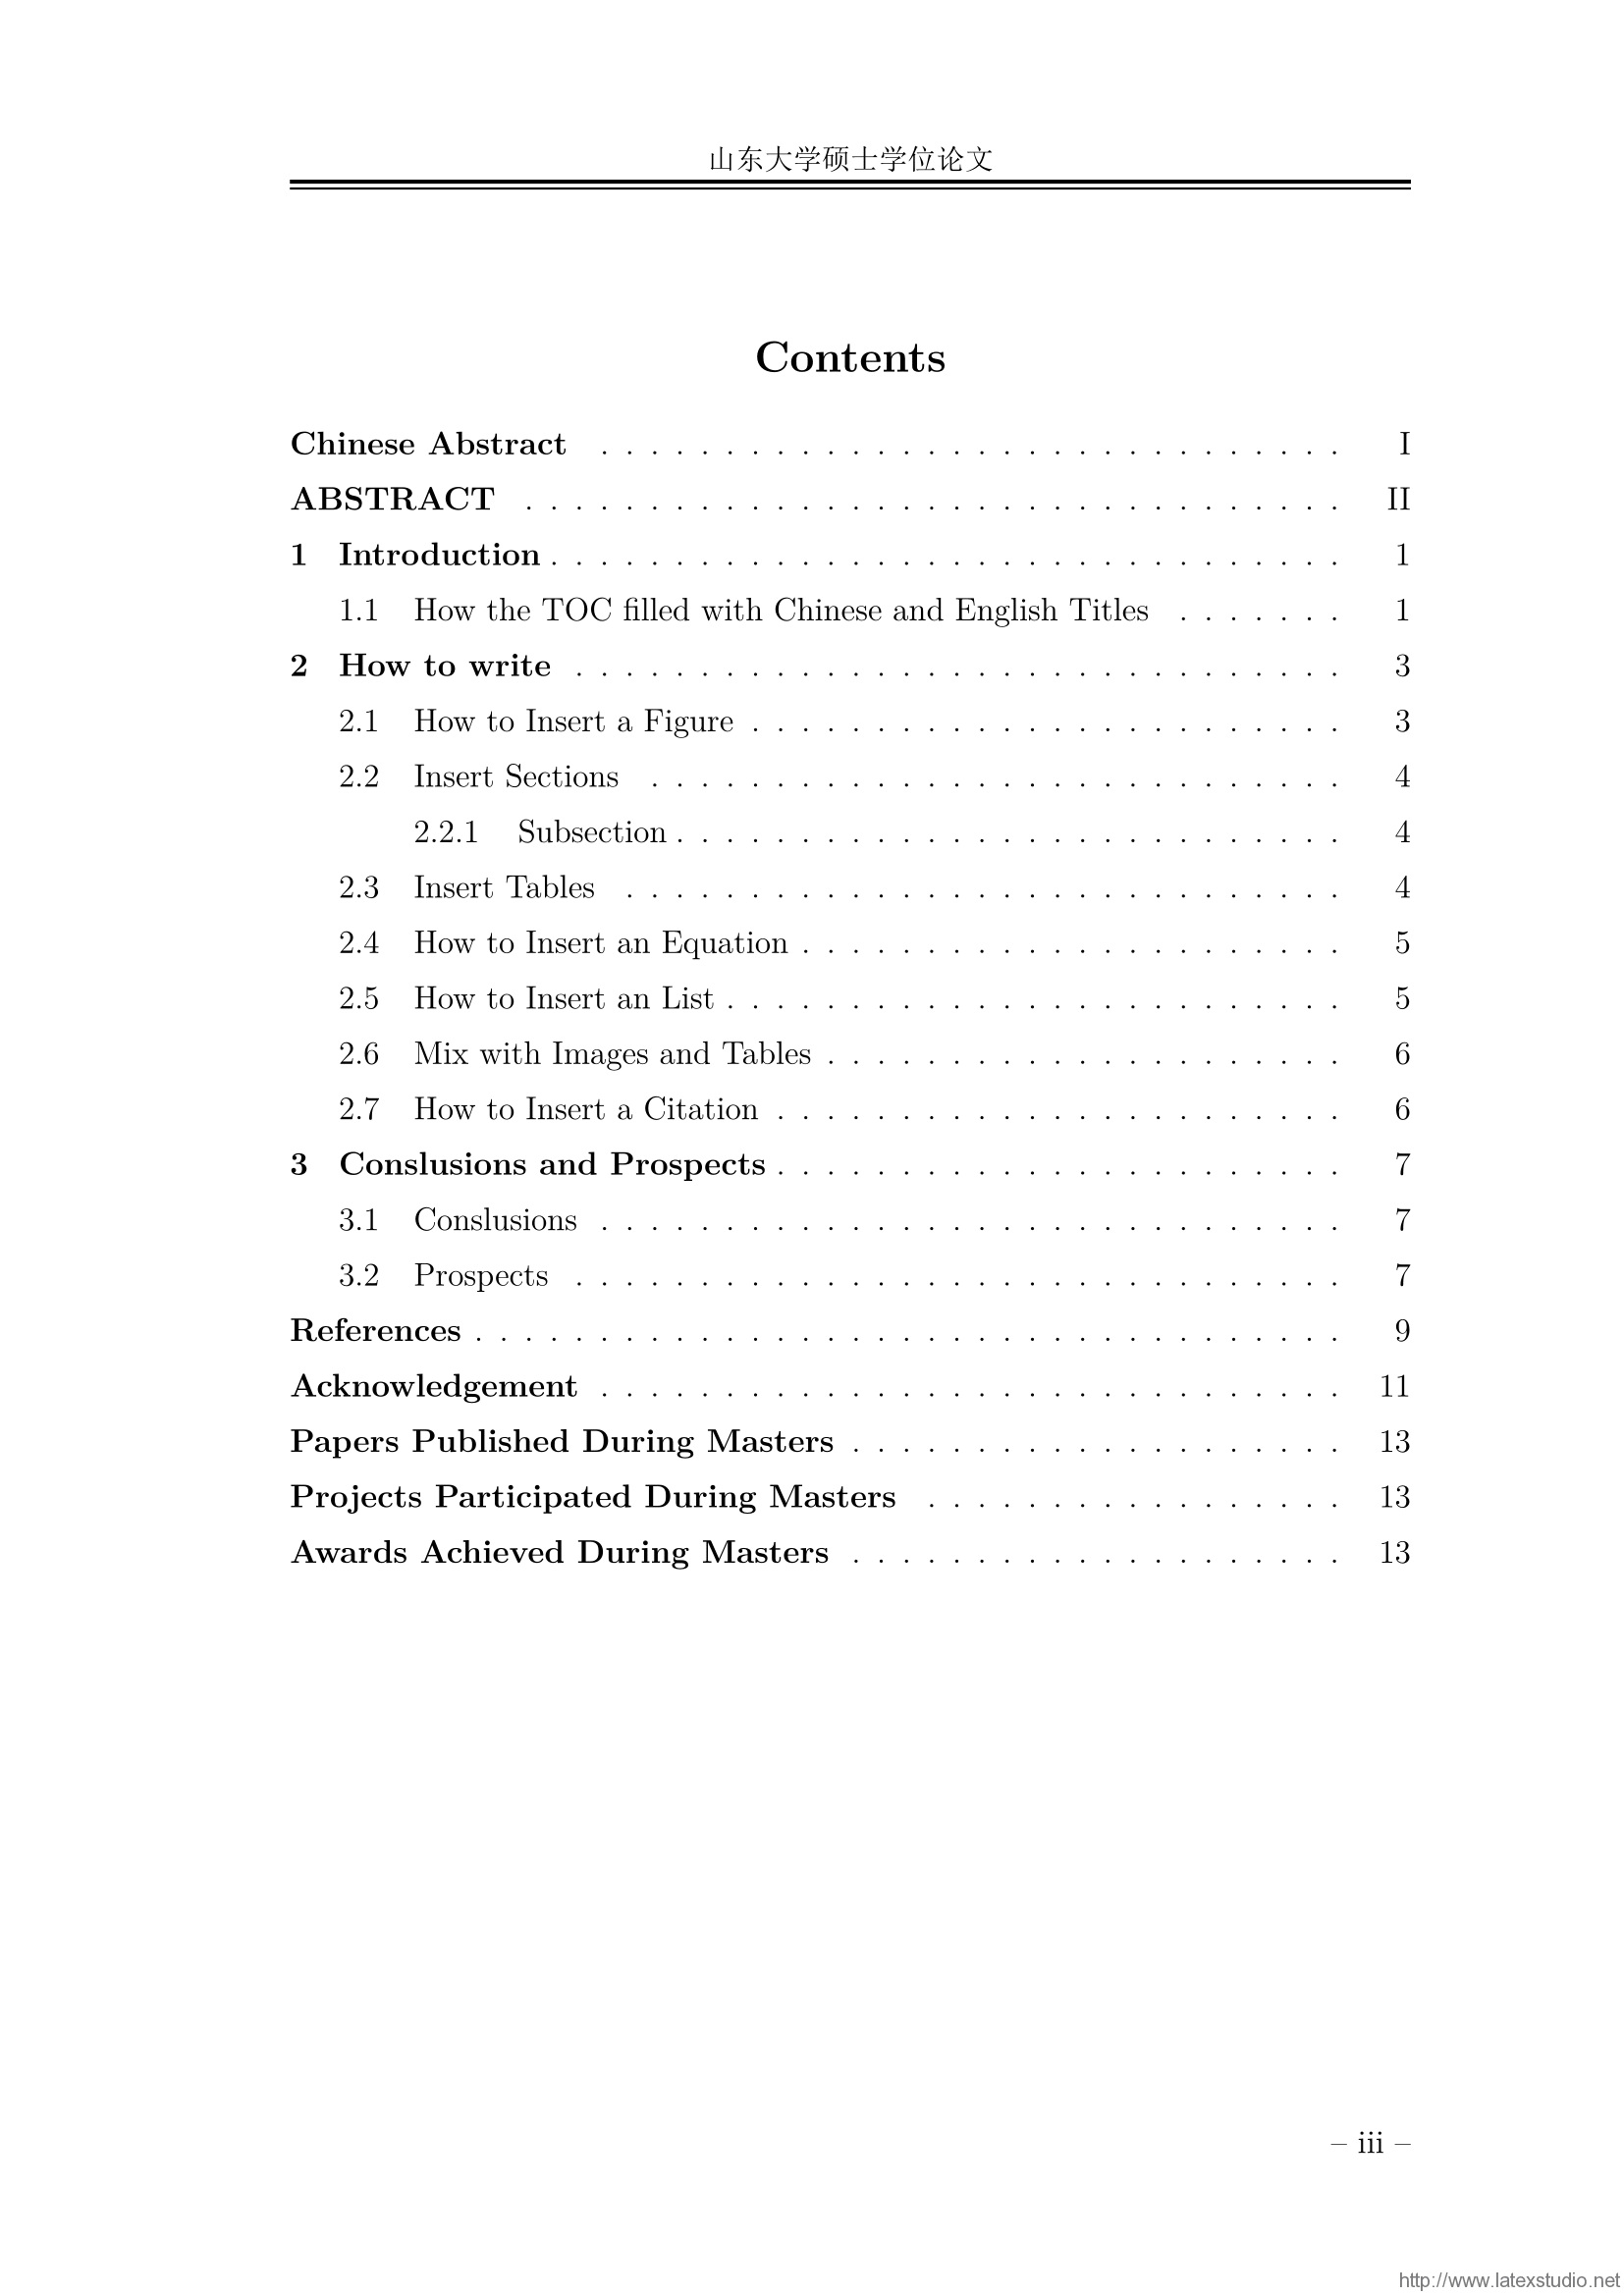 sduthesistemplate-07